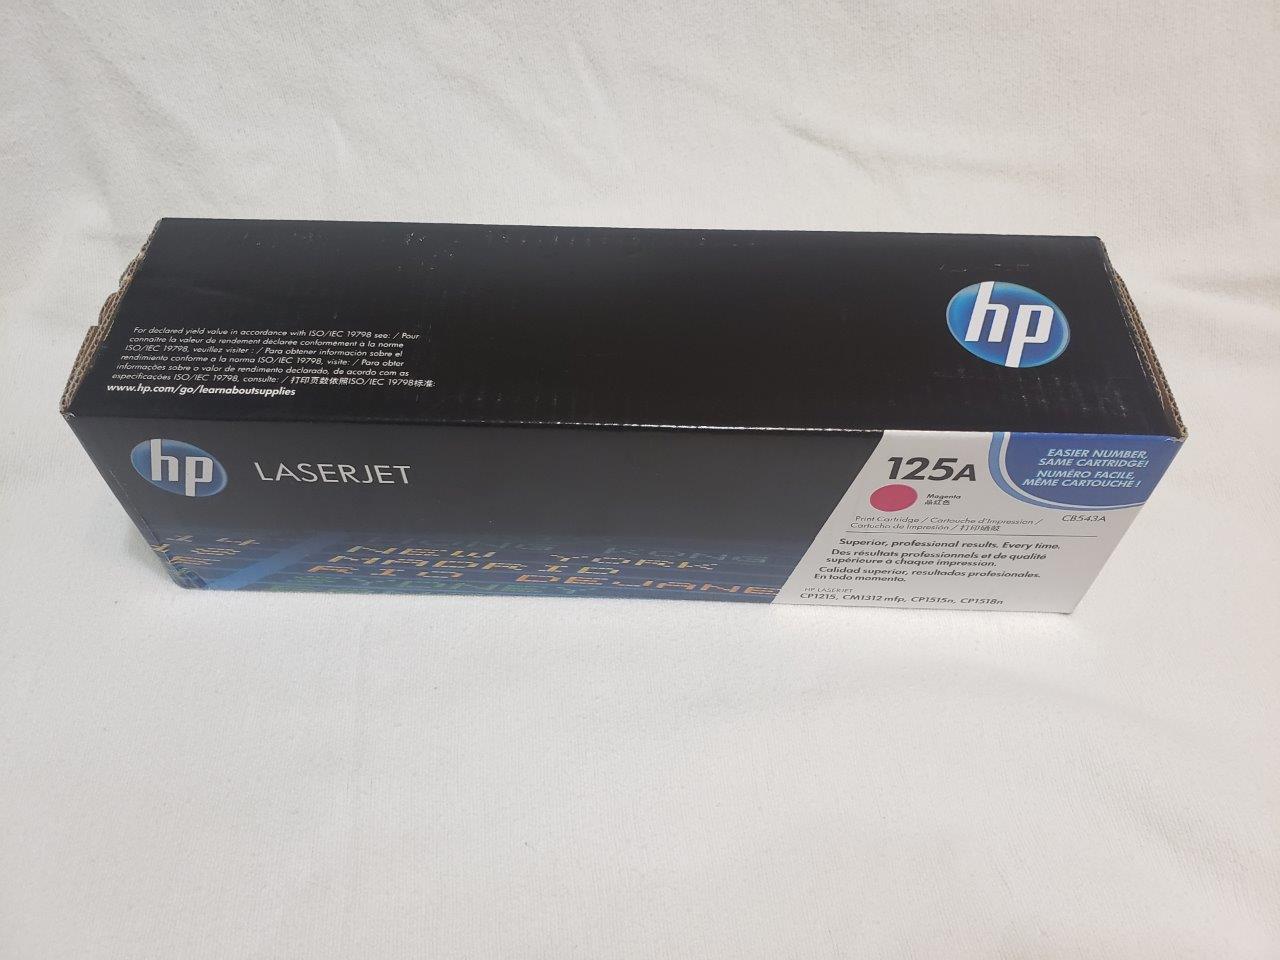 HP 125A Magenta Original LaserJet Toner Cartridge, CB543A  Genuine Sealed for CM1312nfi CP1215 CP1518ni printers